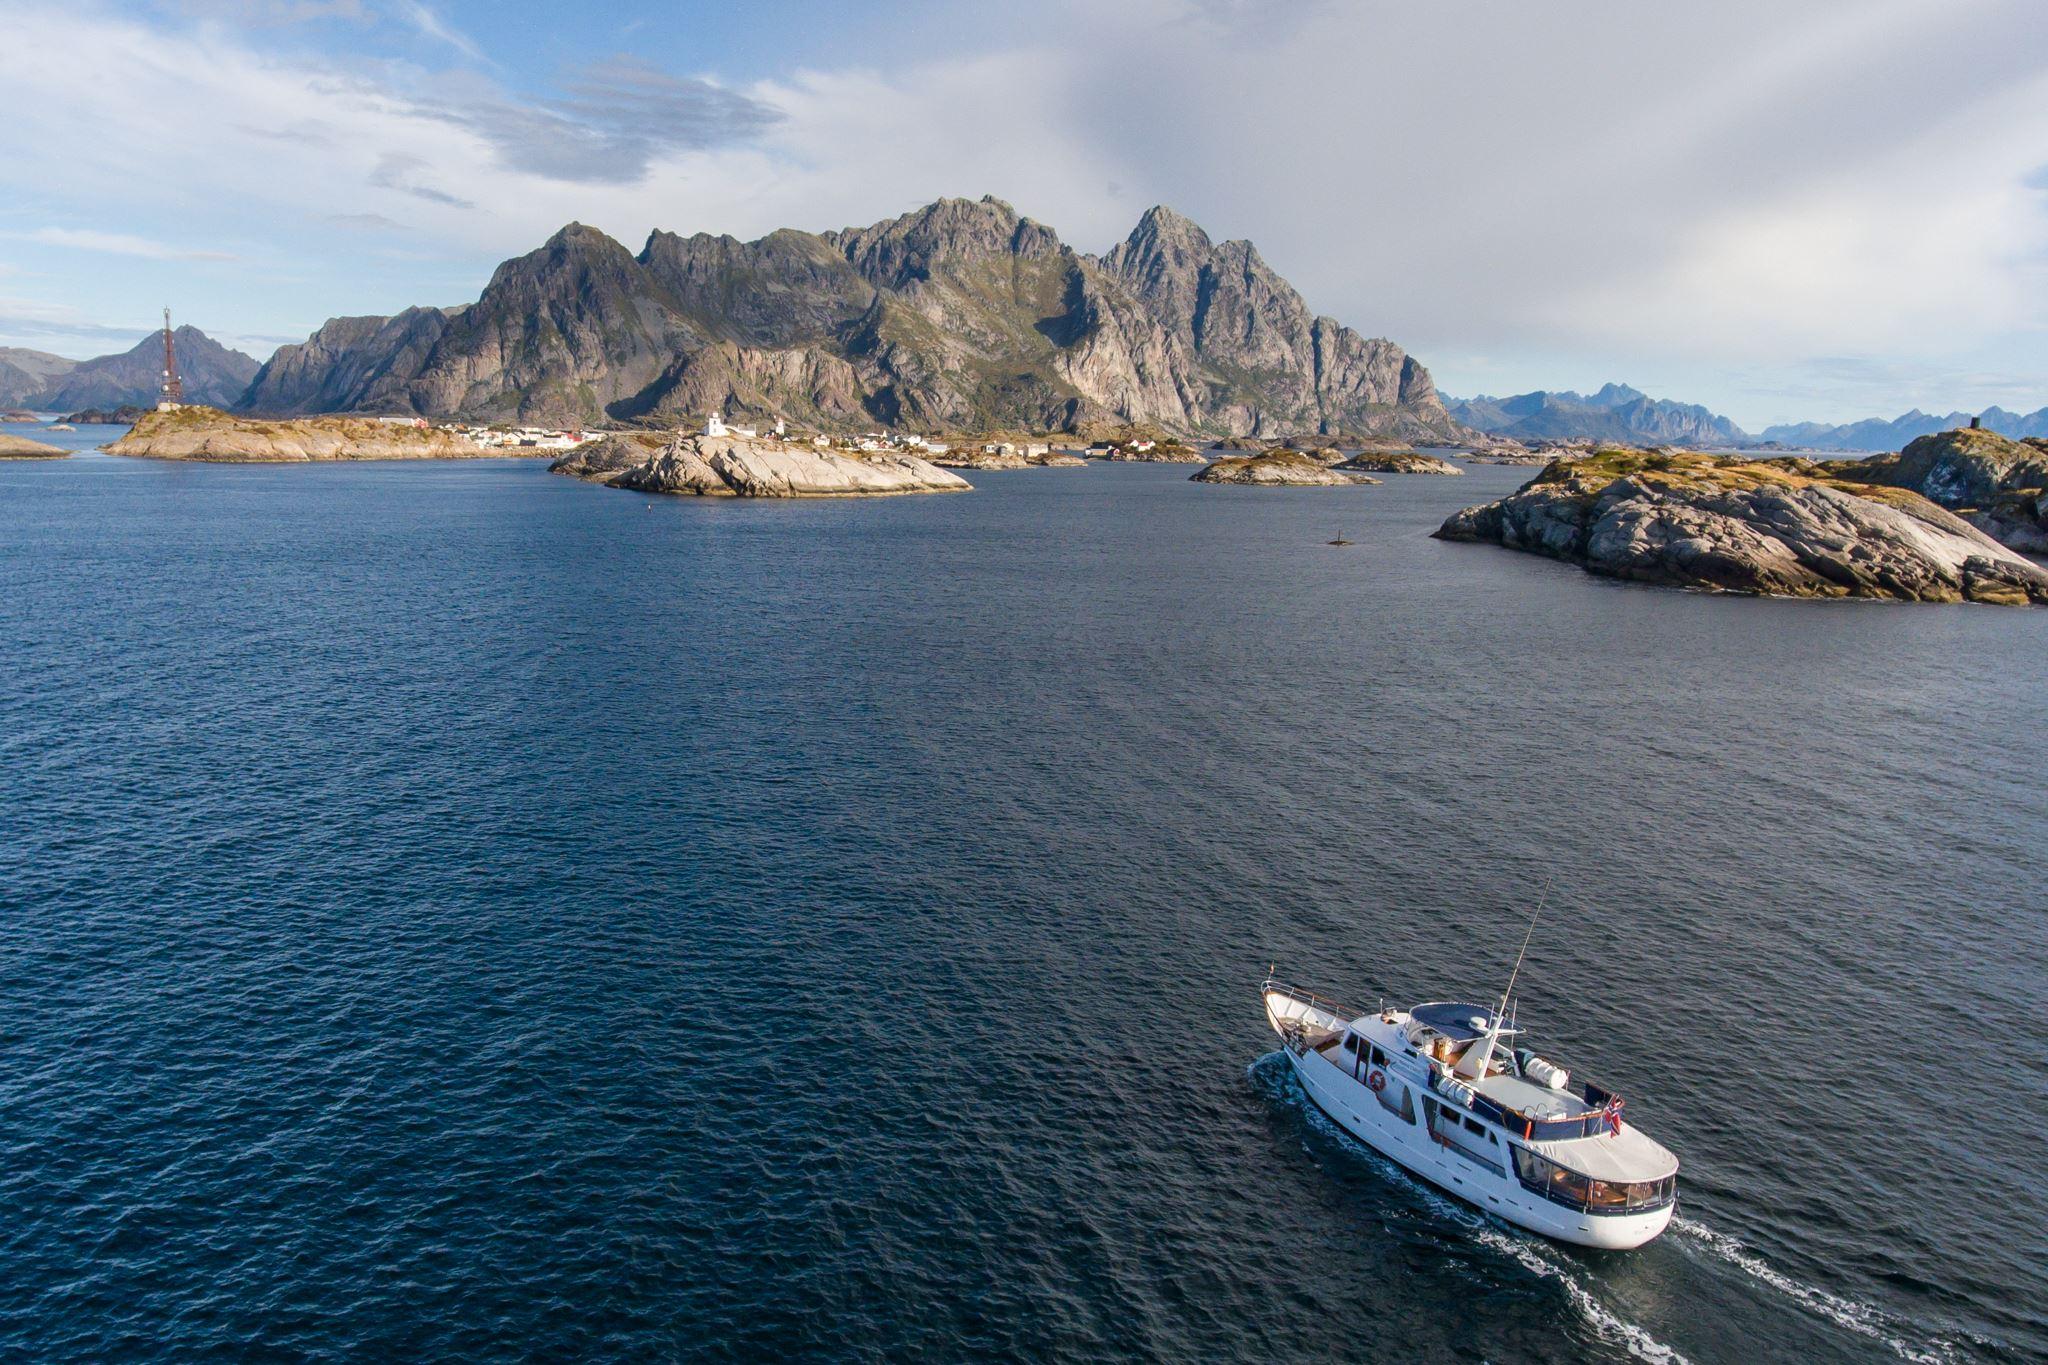 Storslått fjordcruise på luksuriøs yacht – Polar Yacht